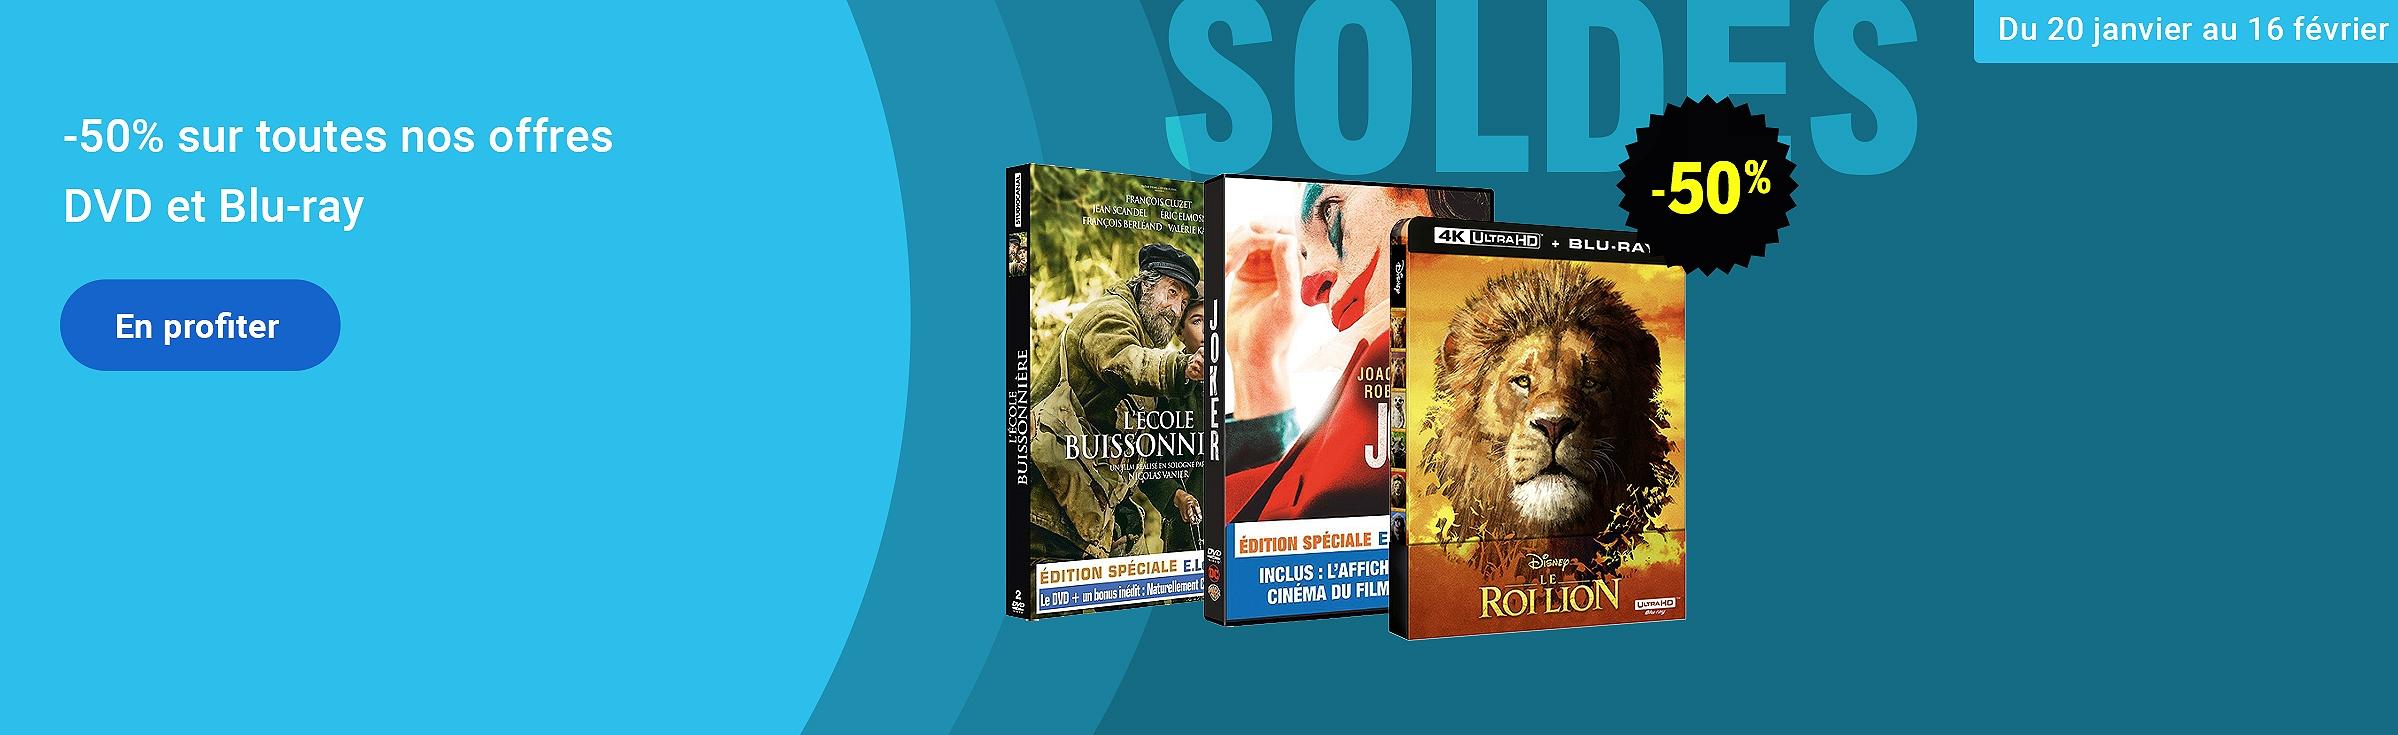 Soldes DVD et Blu-ray